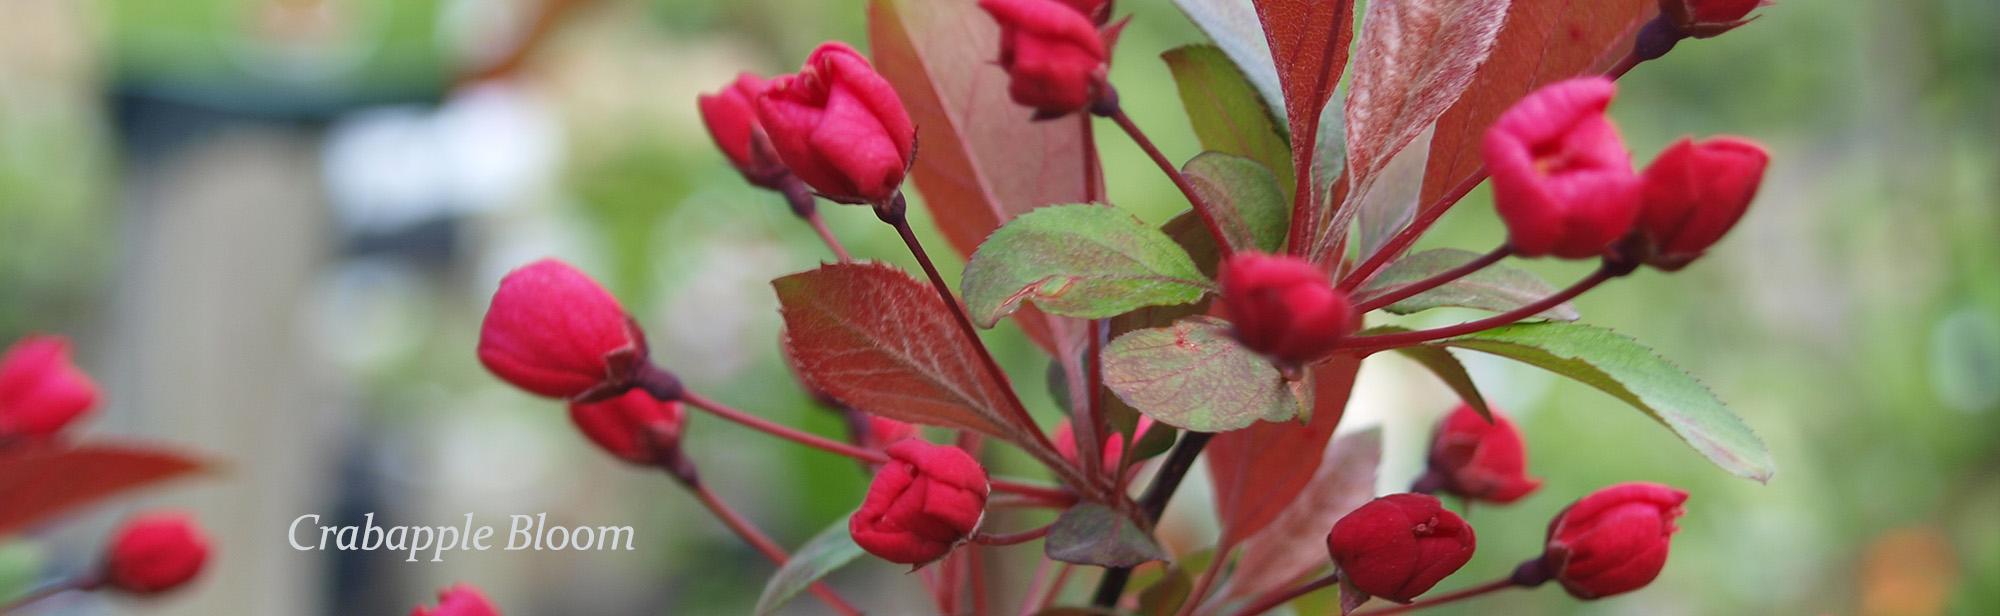 crabapple-tallahassee-bloom